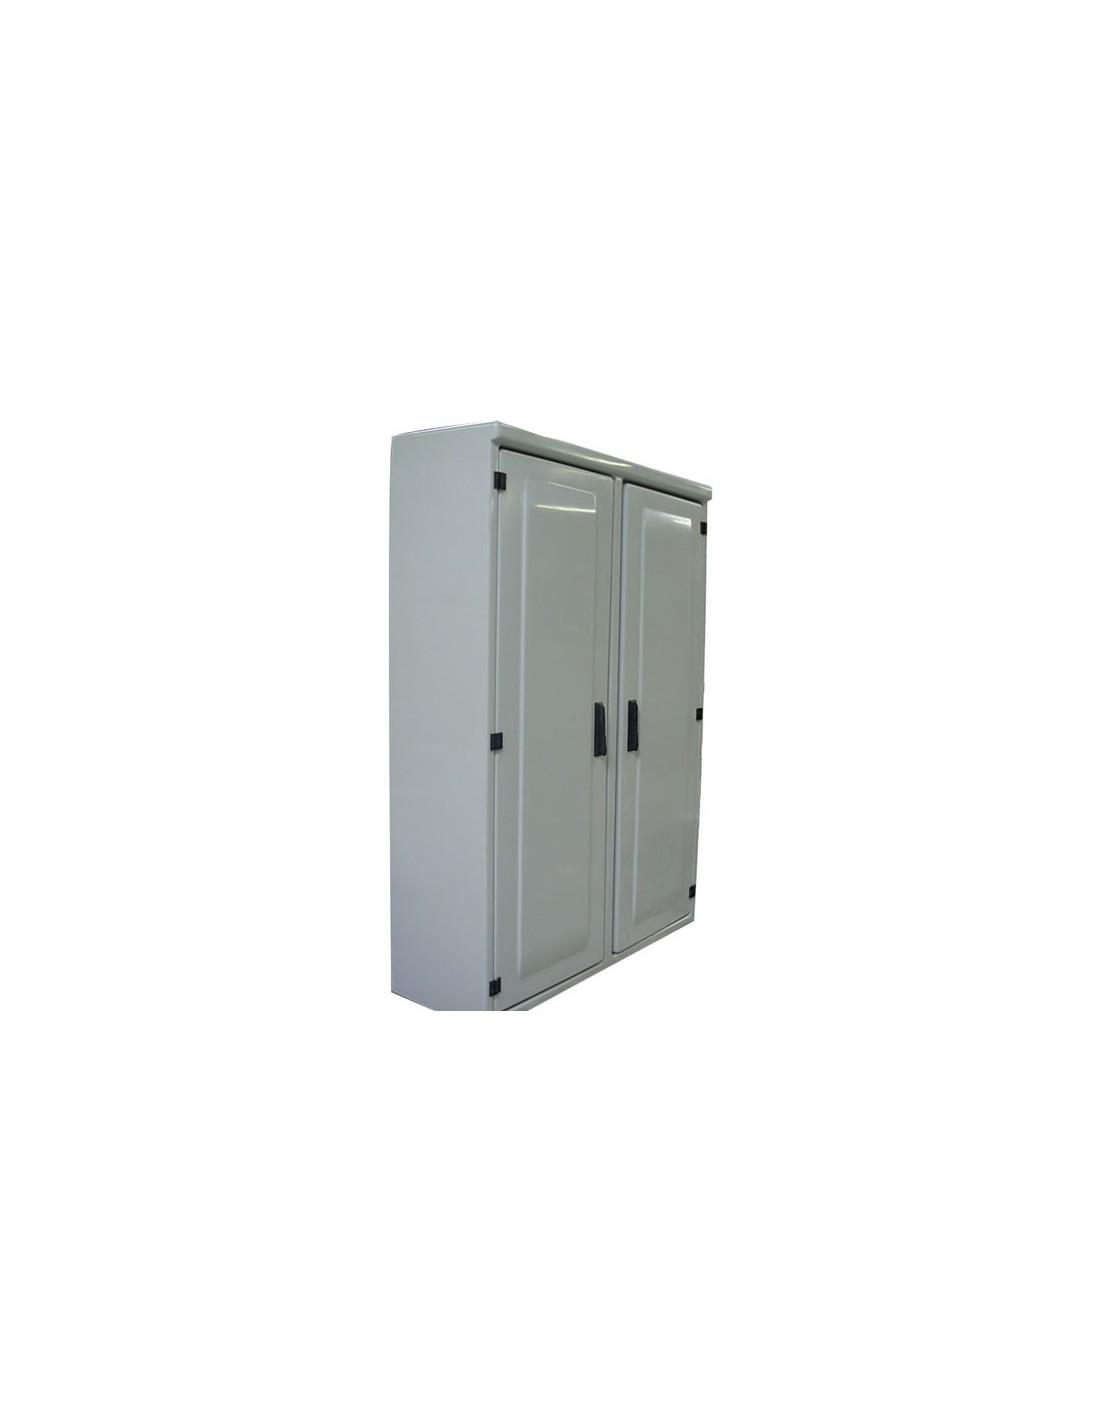 Armadio In Vetroresina.Armadio Batterie 1900 X 1330 X 600 In Vetroresina Aegmarket Com